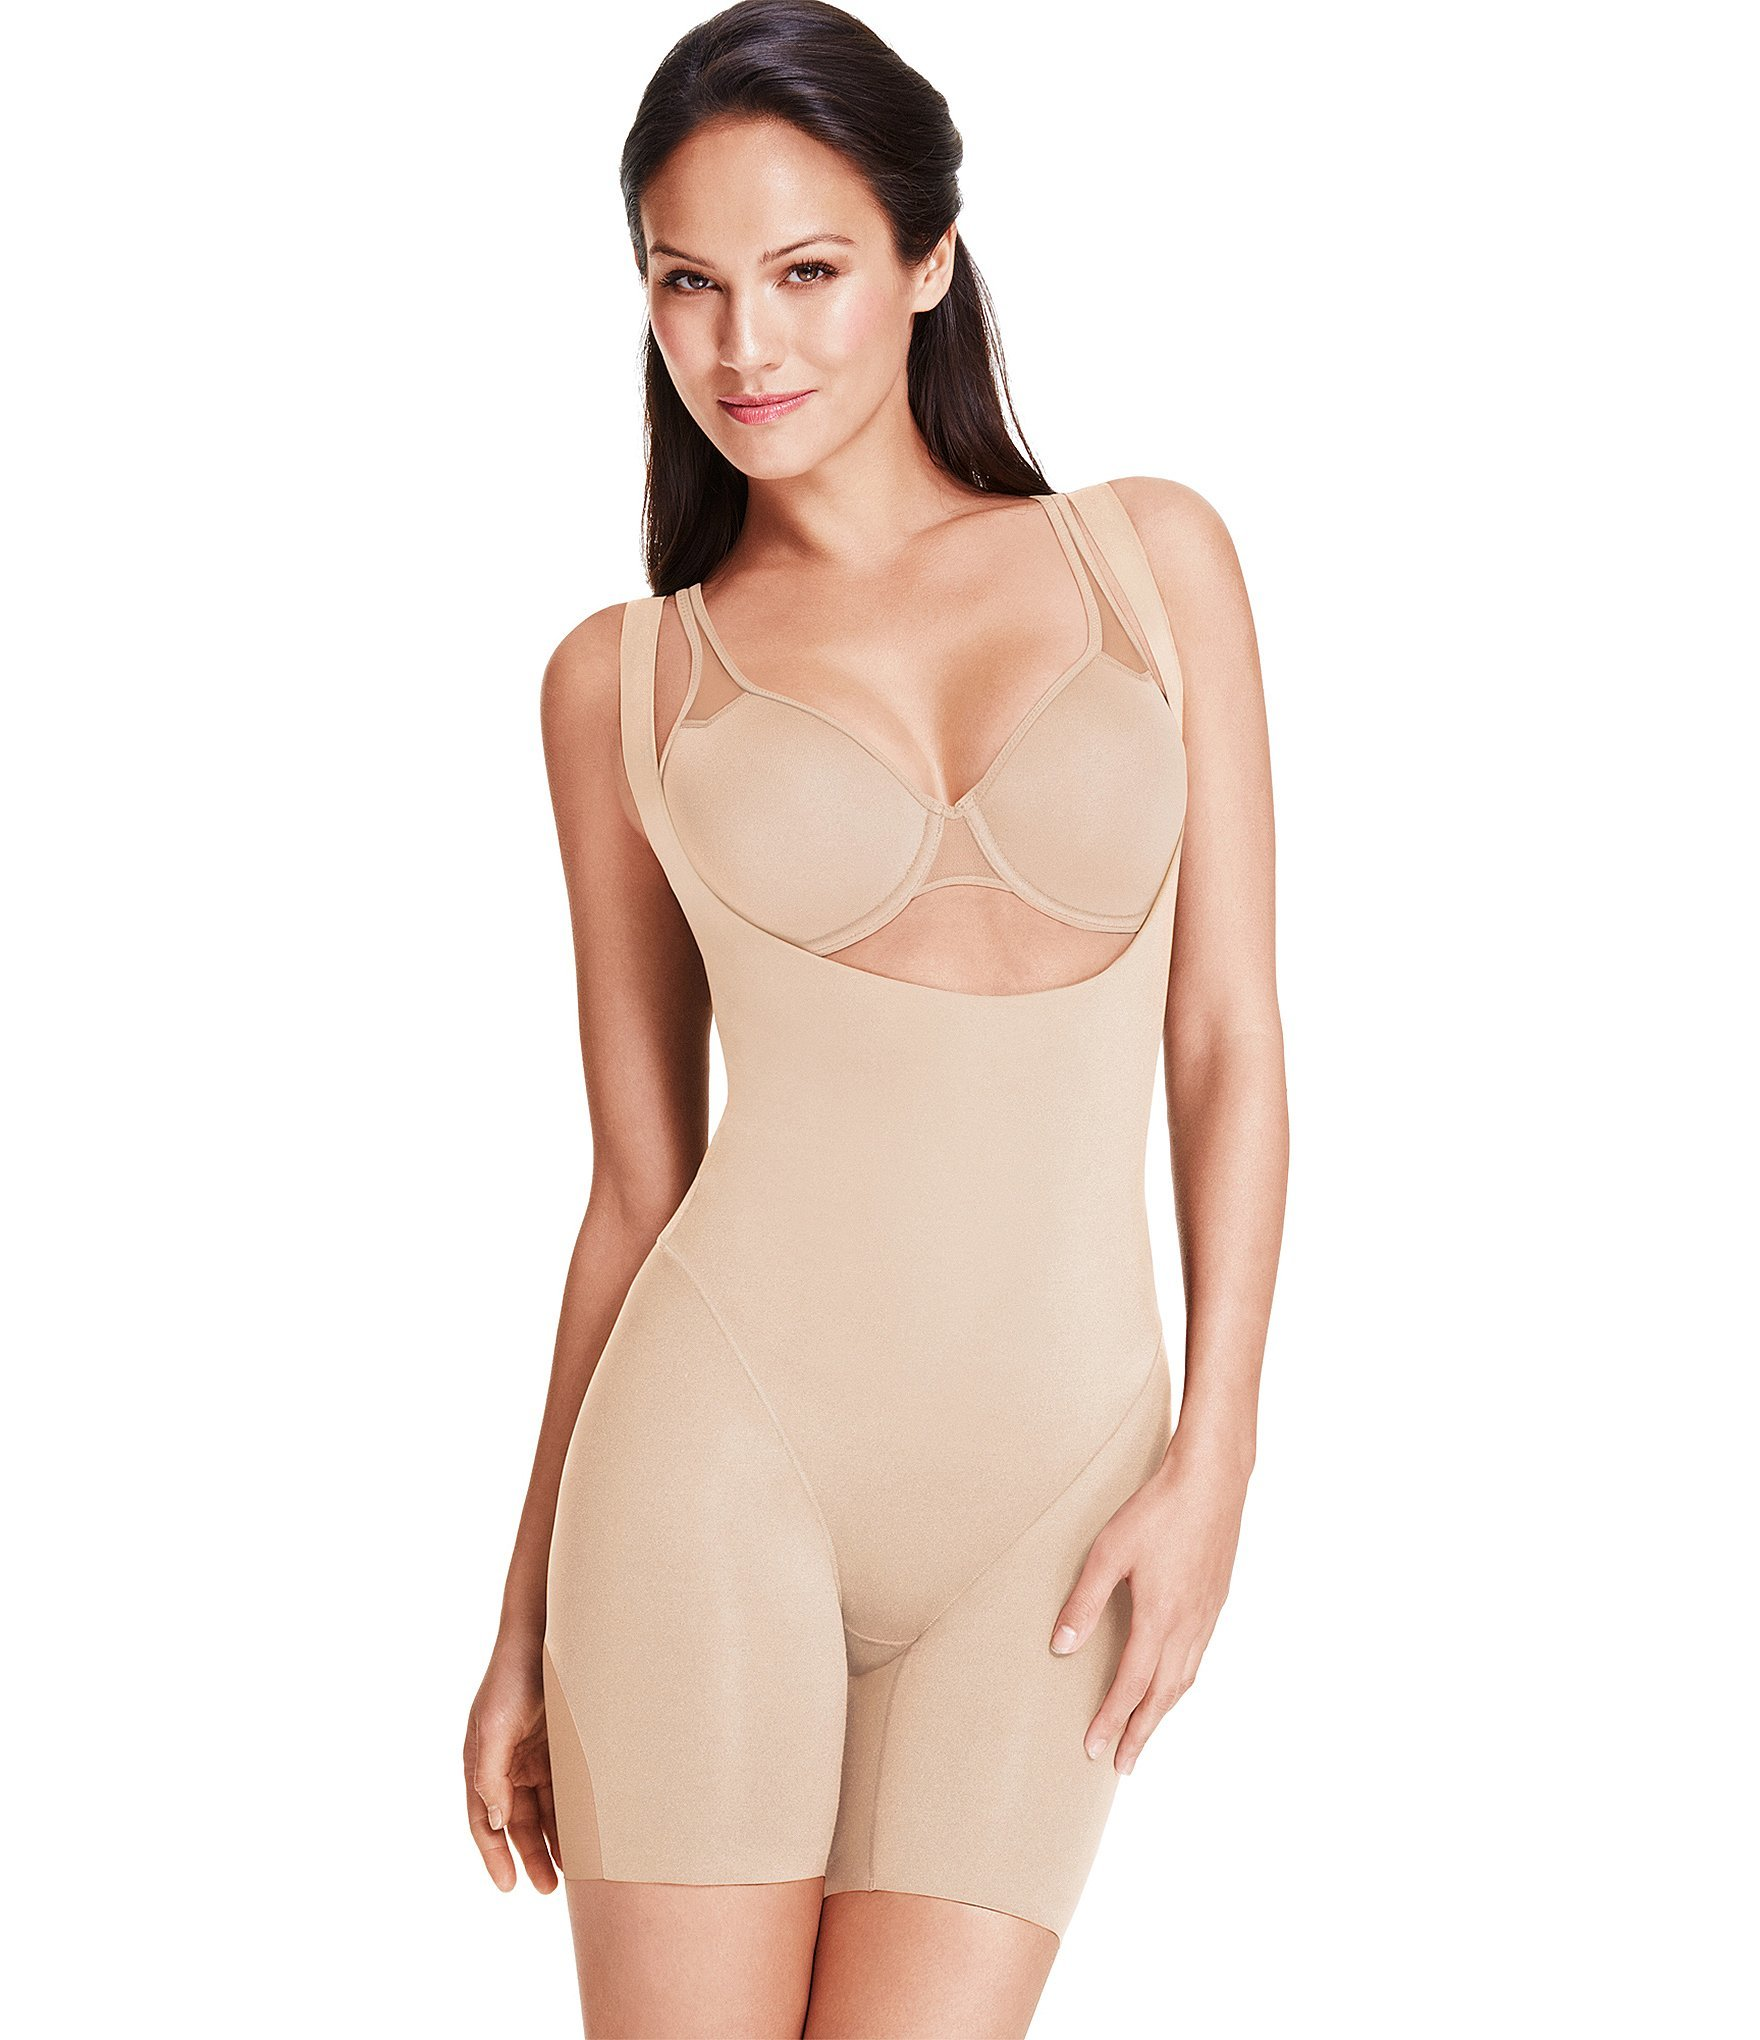 Wacoal Smooth Complexion Torsette Bodysuit Shaper